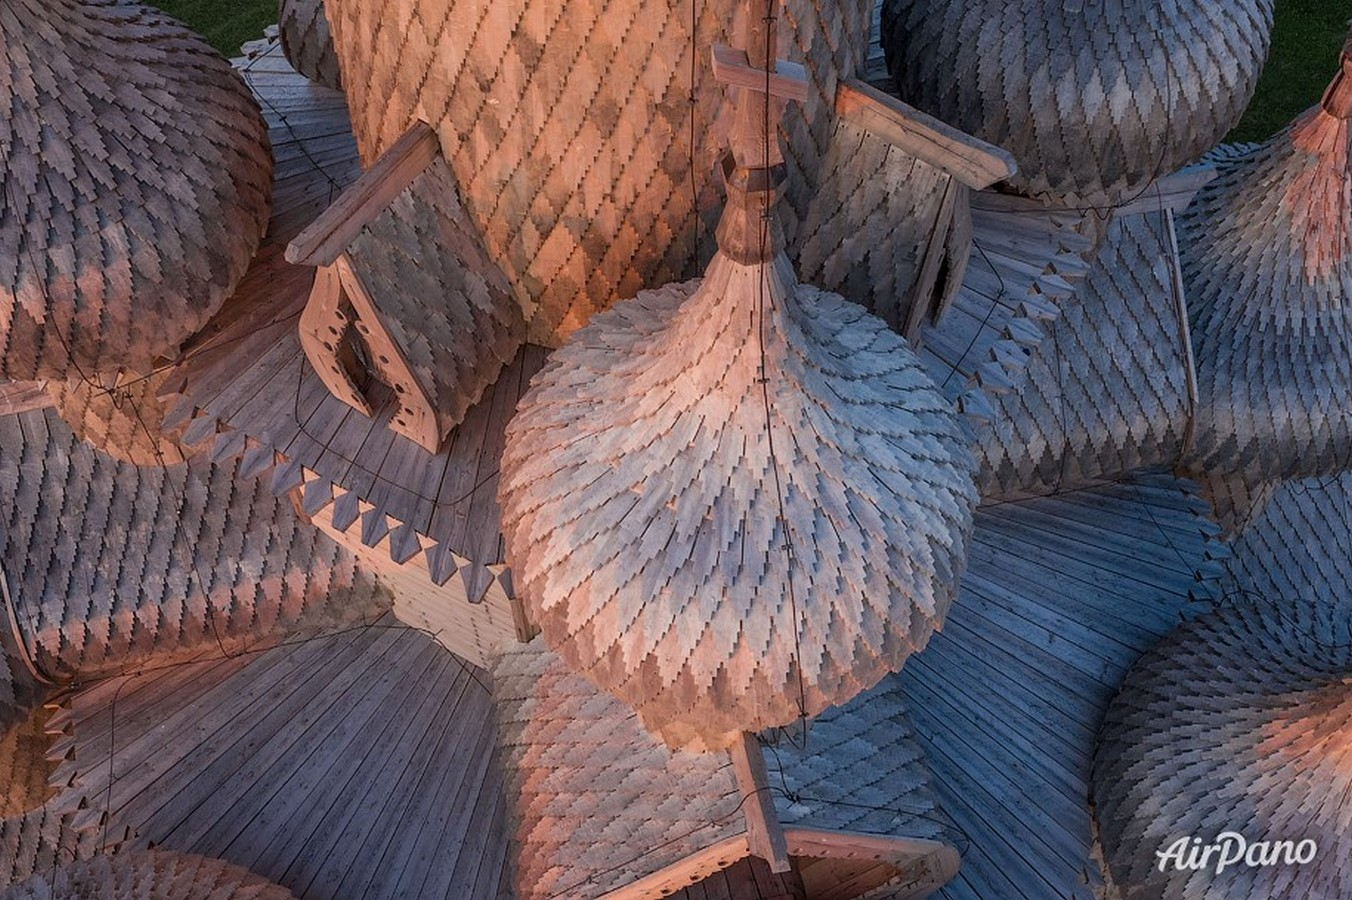 Wooden Architecture of Kizhi Island, Russia - Sheet6